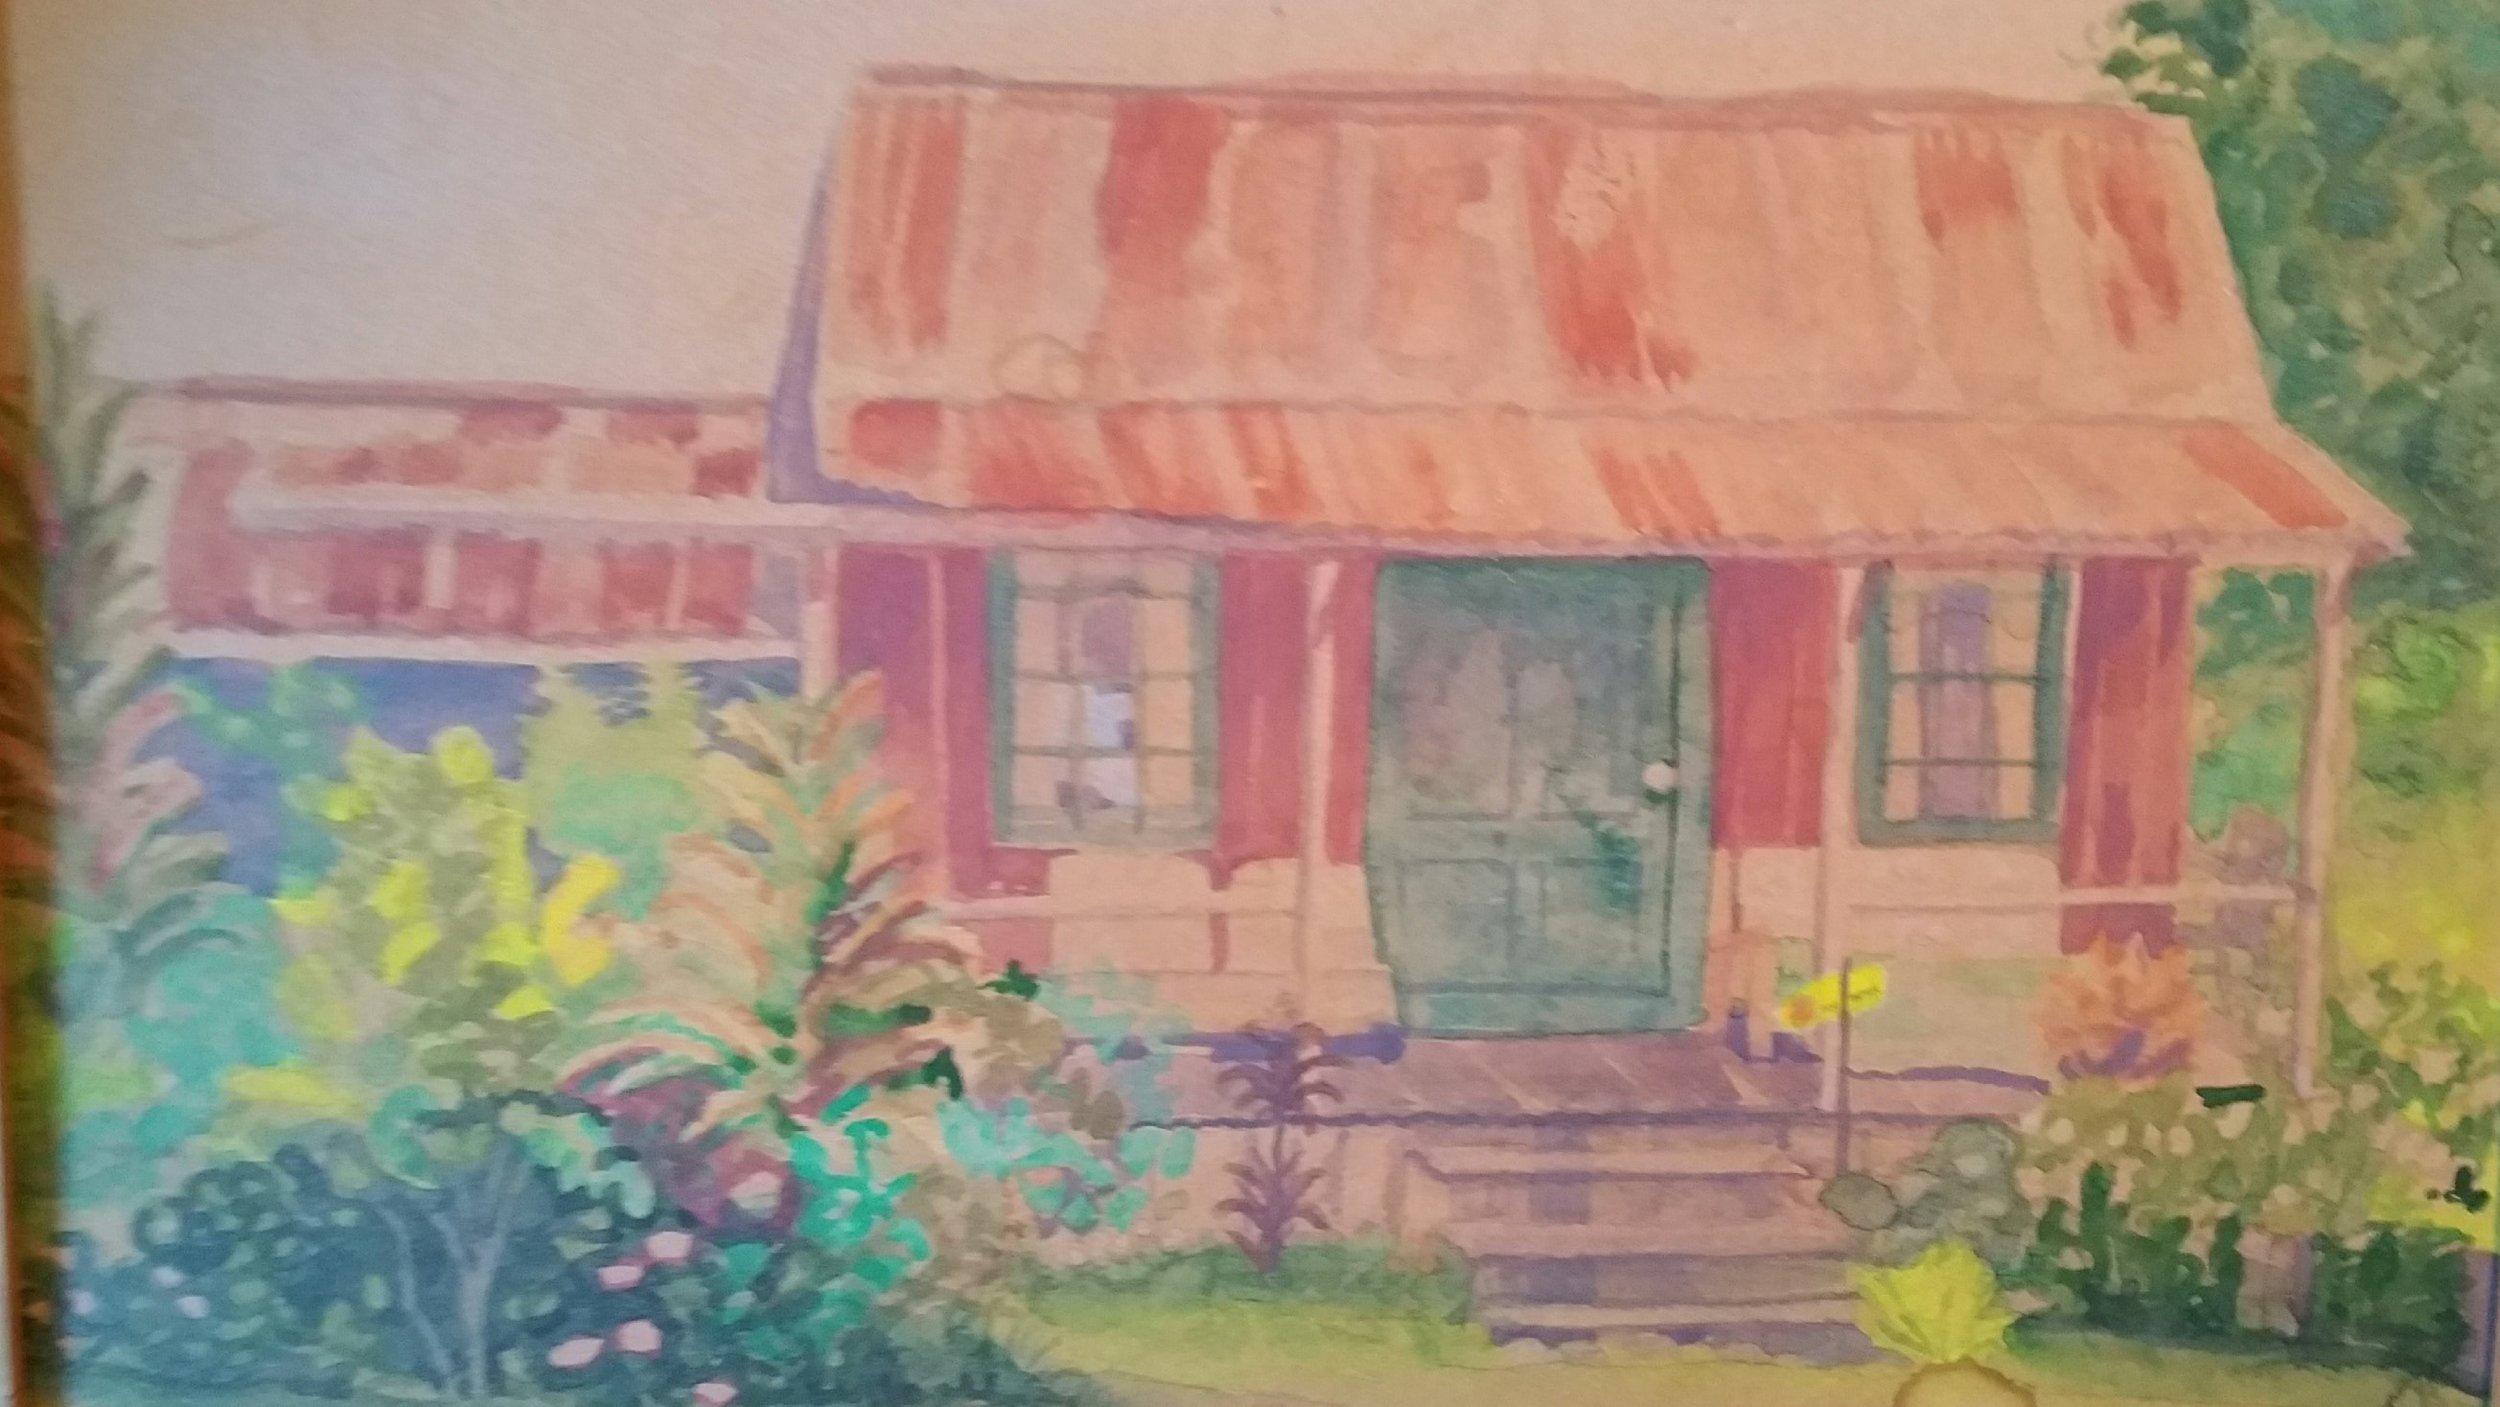 Plantation Style Homes and Real Estate — Hale Ho'okipa Inn ... on big villa, big balloons, big styles of homes, big estate home, big houses,